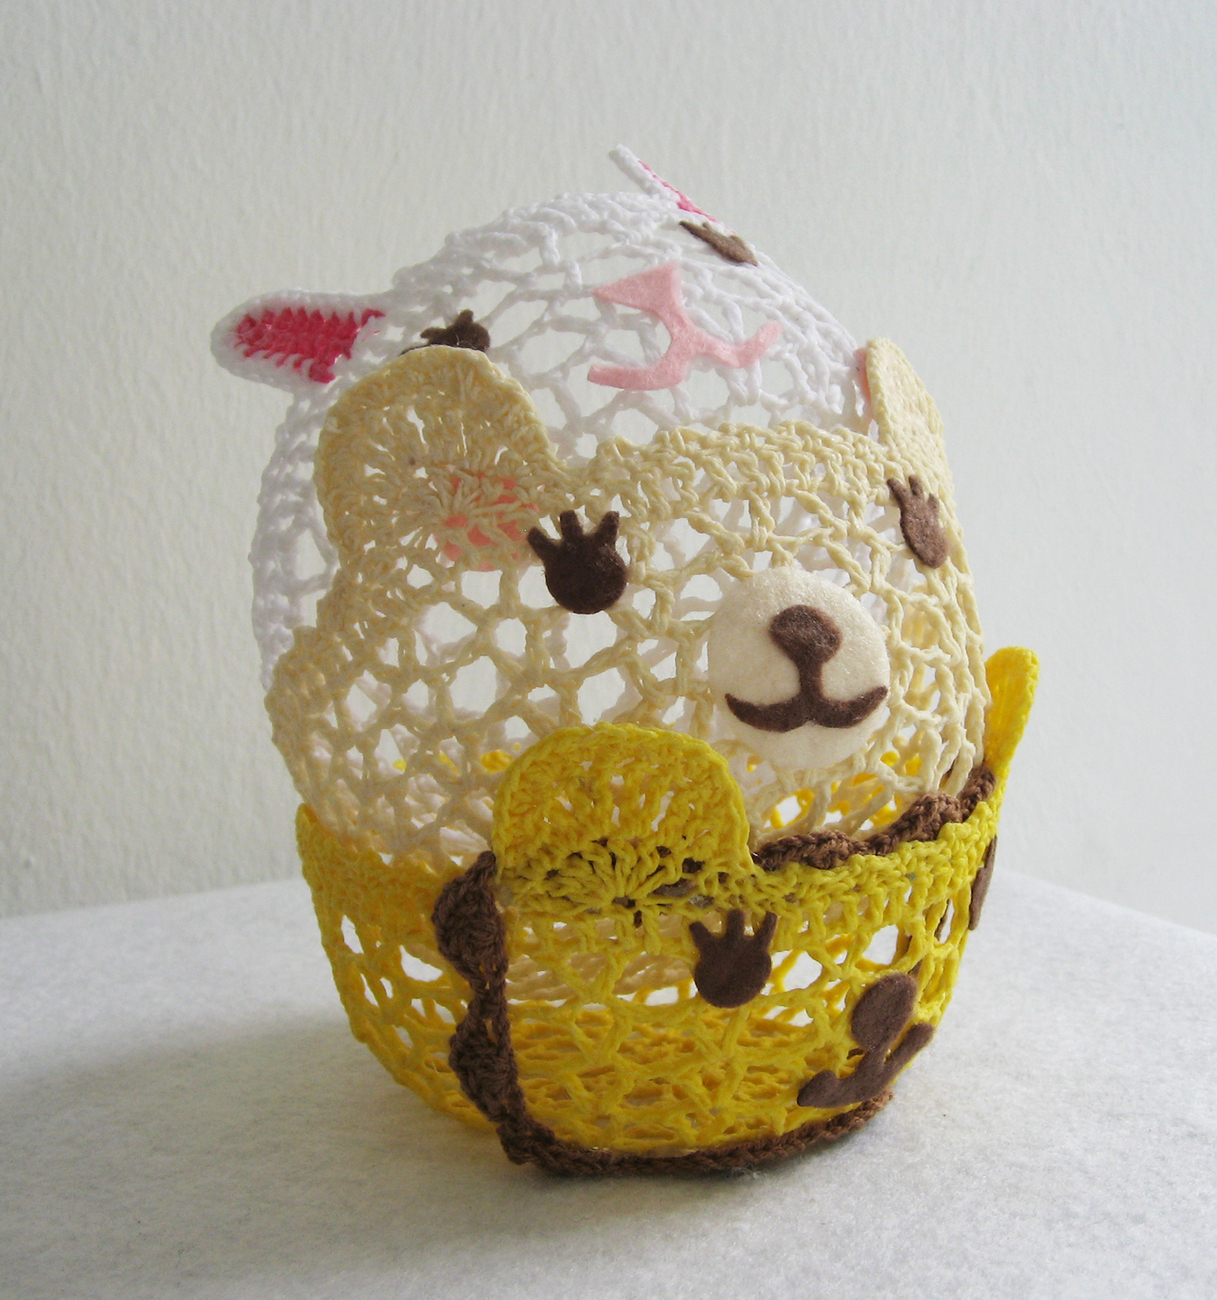 Handmade Smiling Animals Crochet Lace Baskets. Set Of Three.